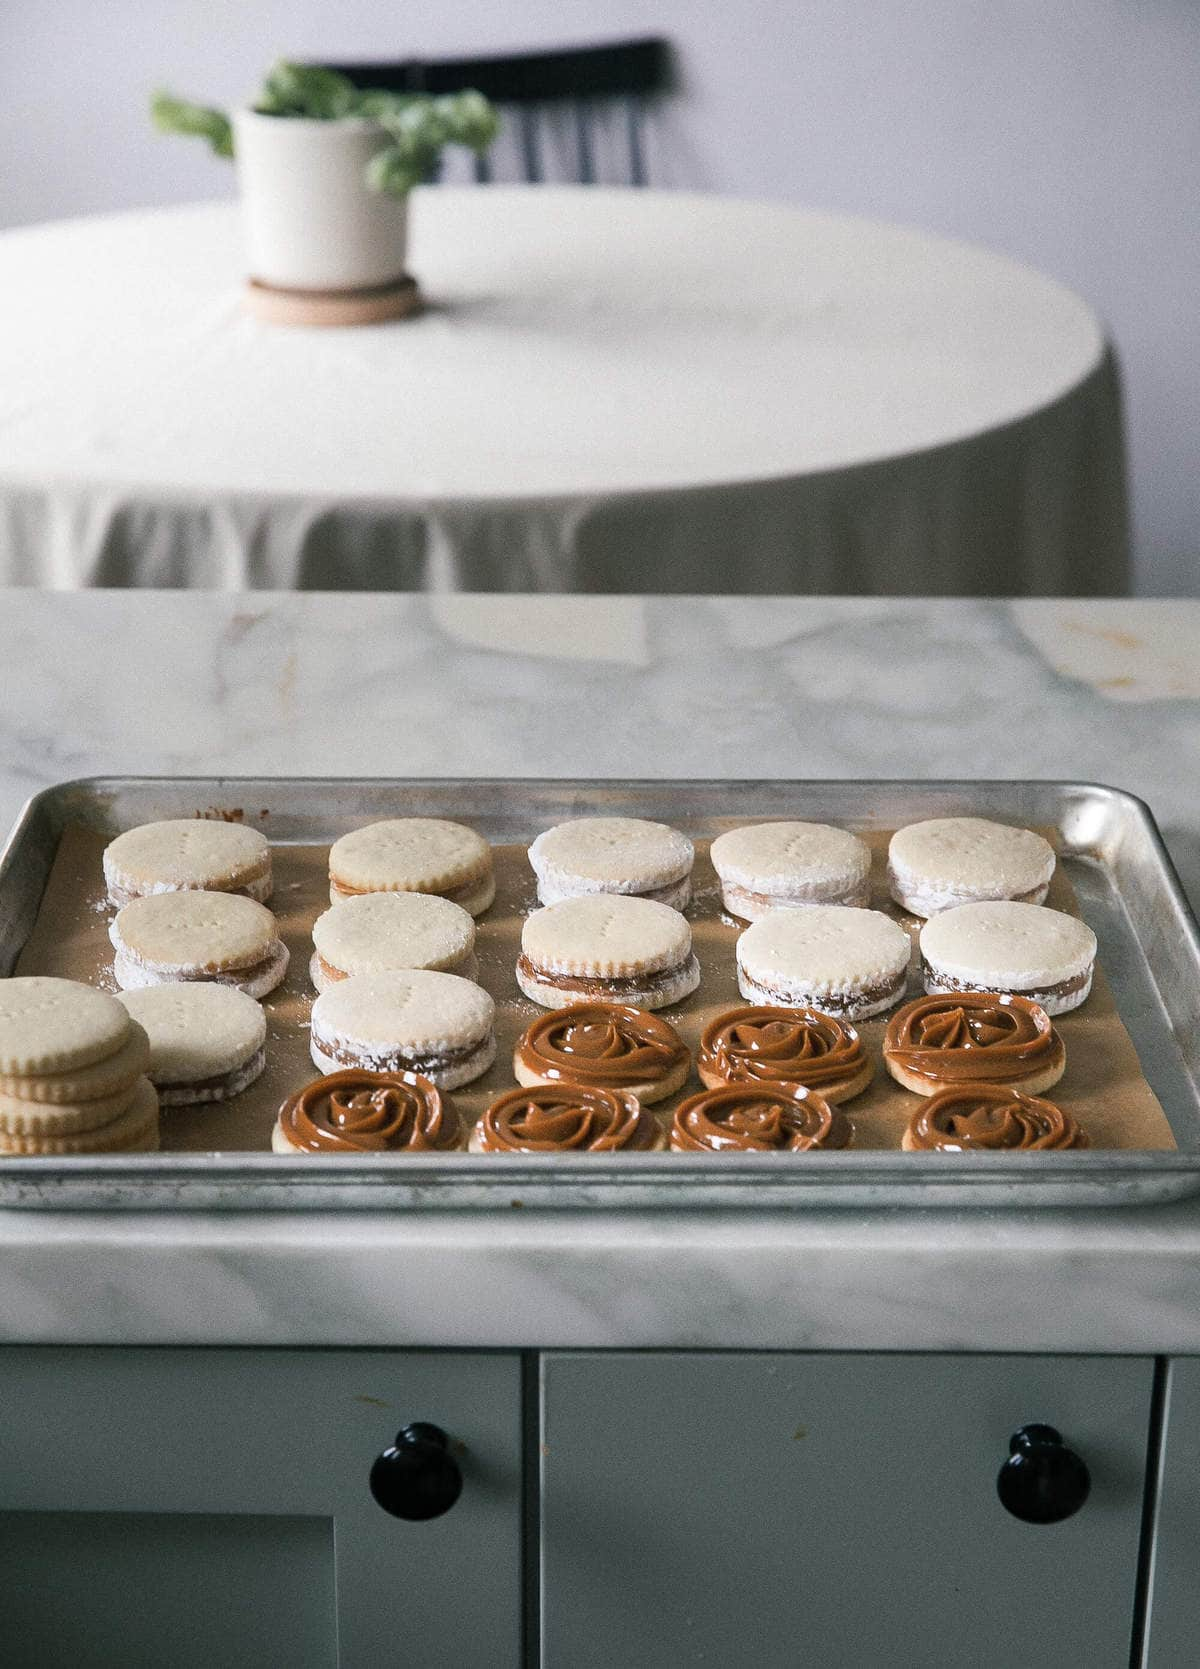 alfajores on baking sheet